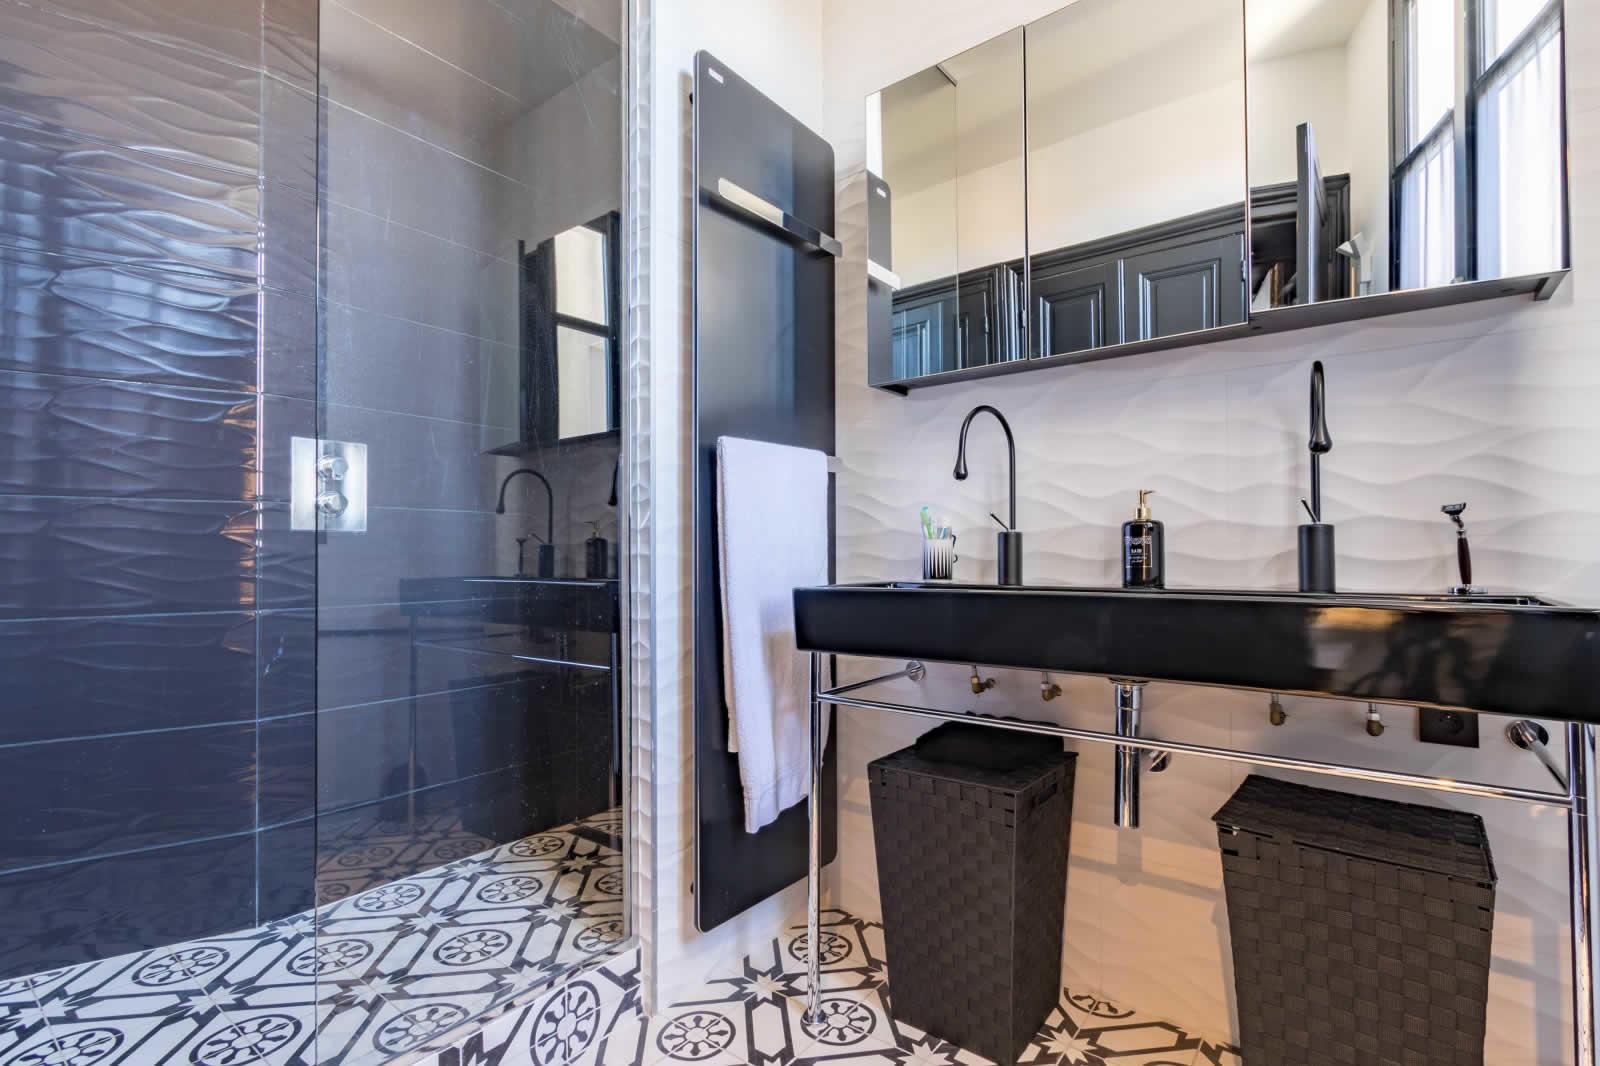 bel-appartement-a-vendre-triangle-dor-copernic-balcon-filant-vue-degagee-parking